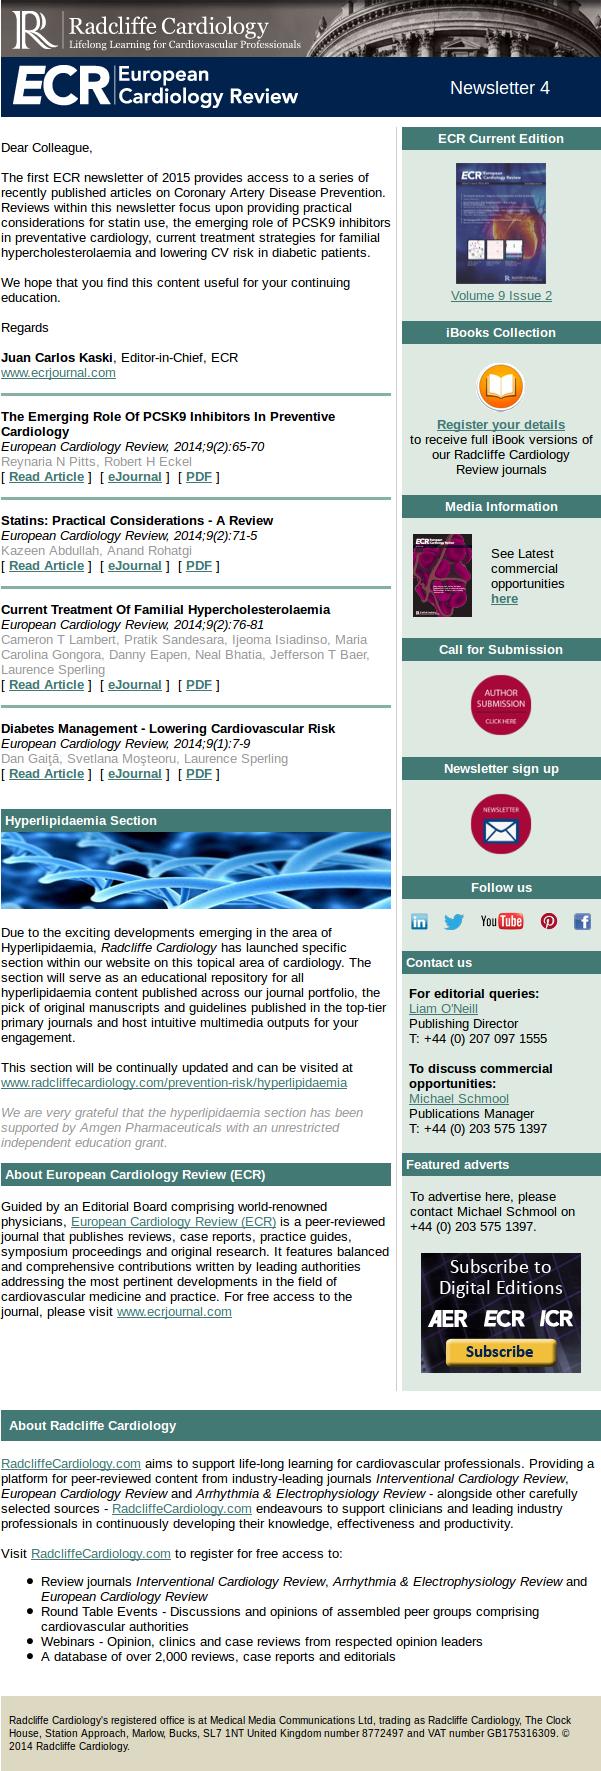 European Cardiology Review (ECR) Newsletter 4